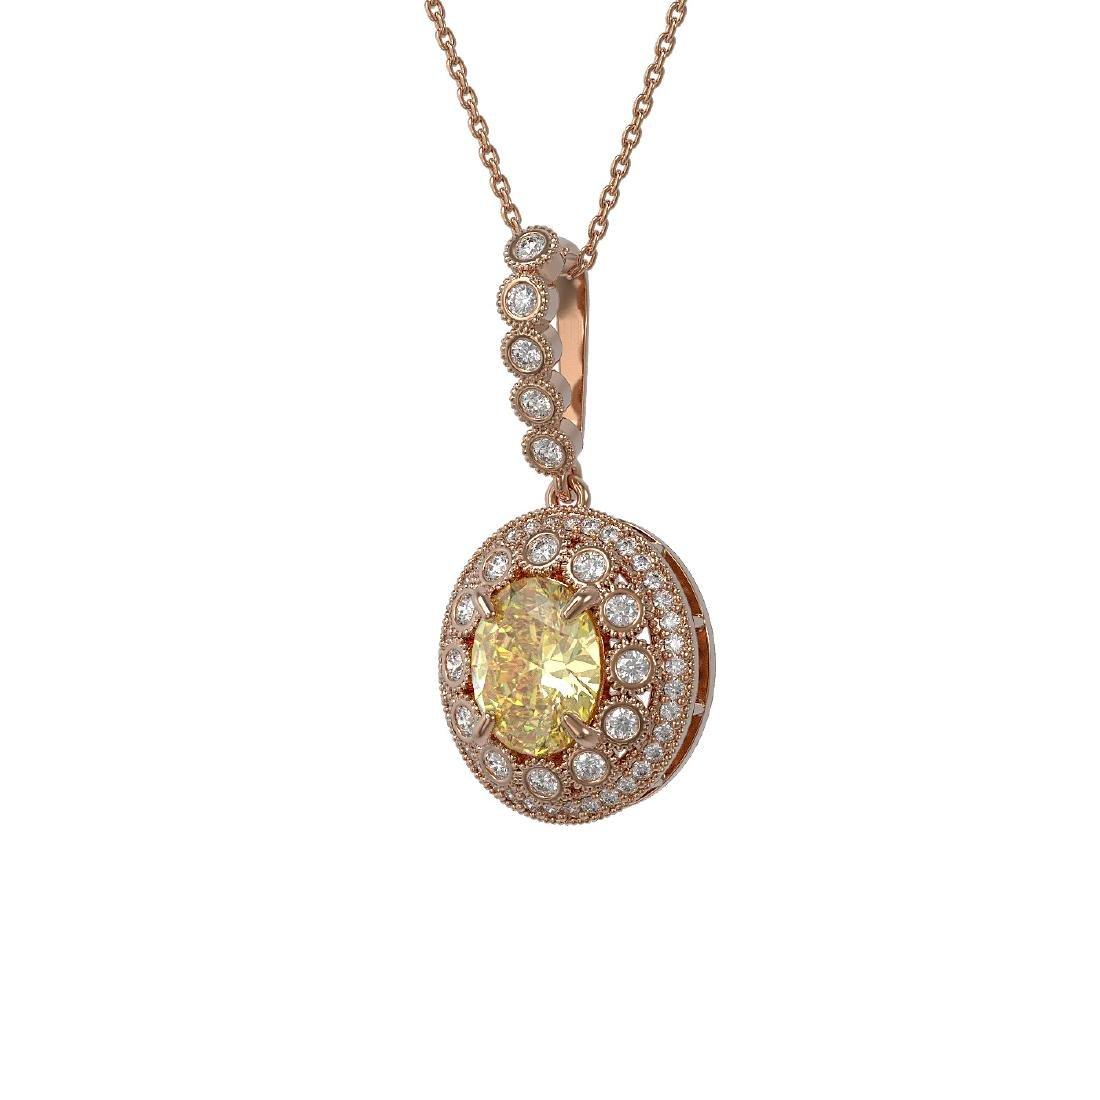 3.87 ctw Canary Citrine & Diamond Necklace 14K Rose